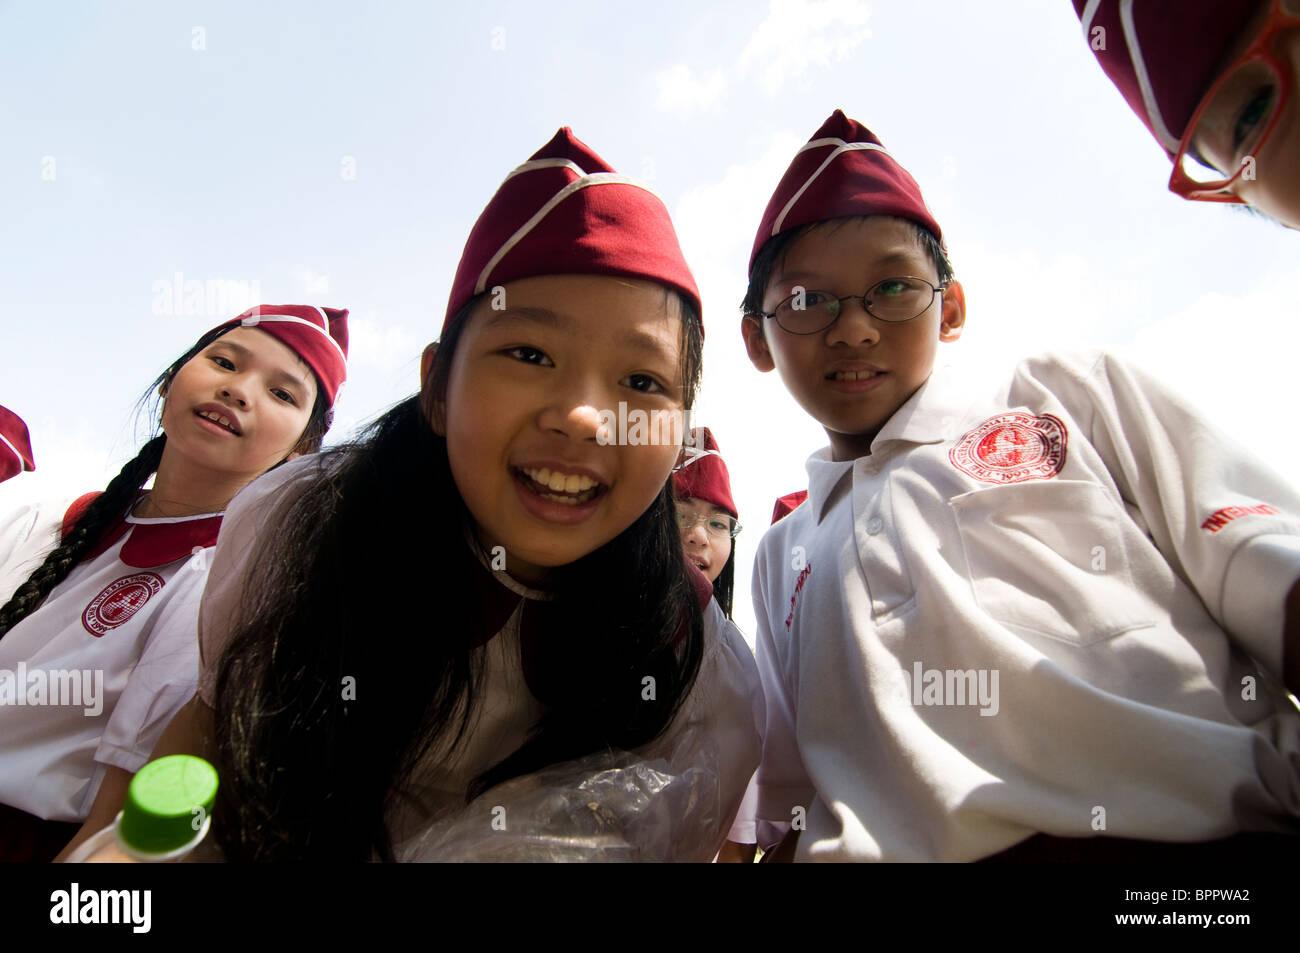 Vietnamese school children dressed up in their school uniform. - Stock Image